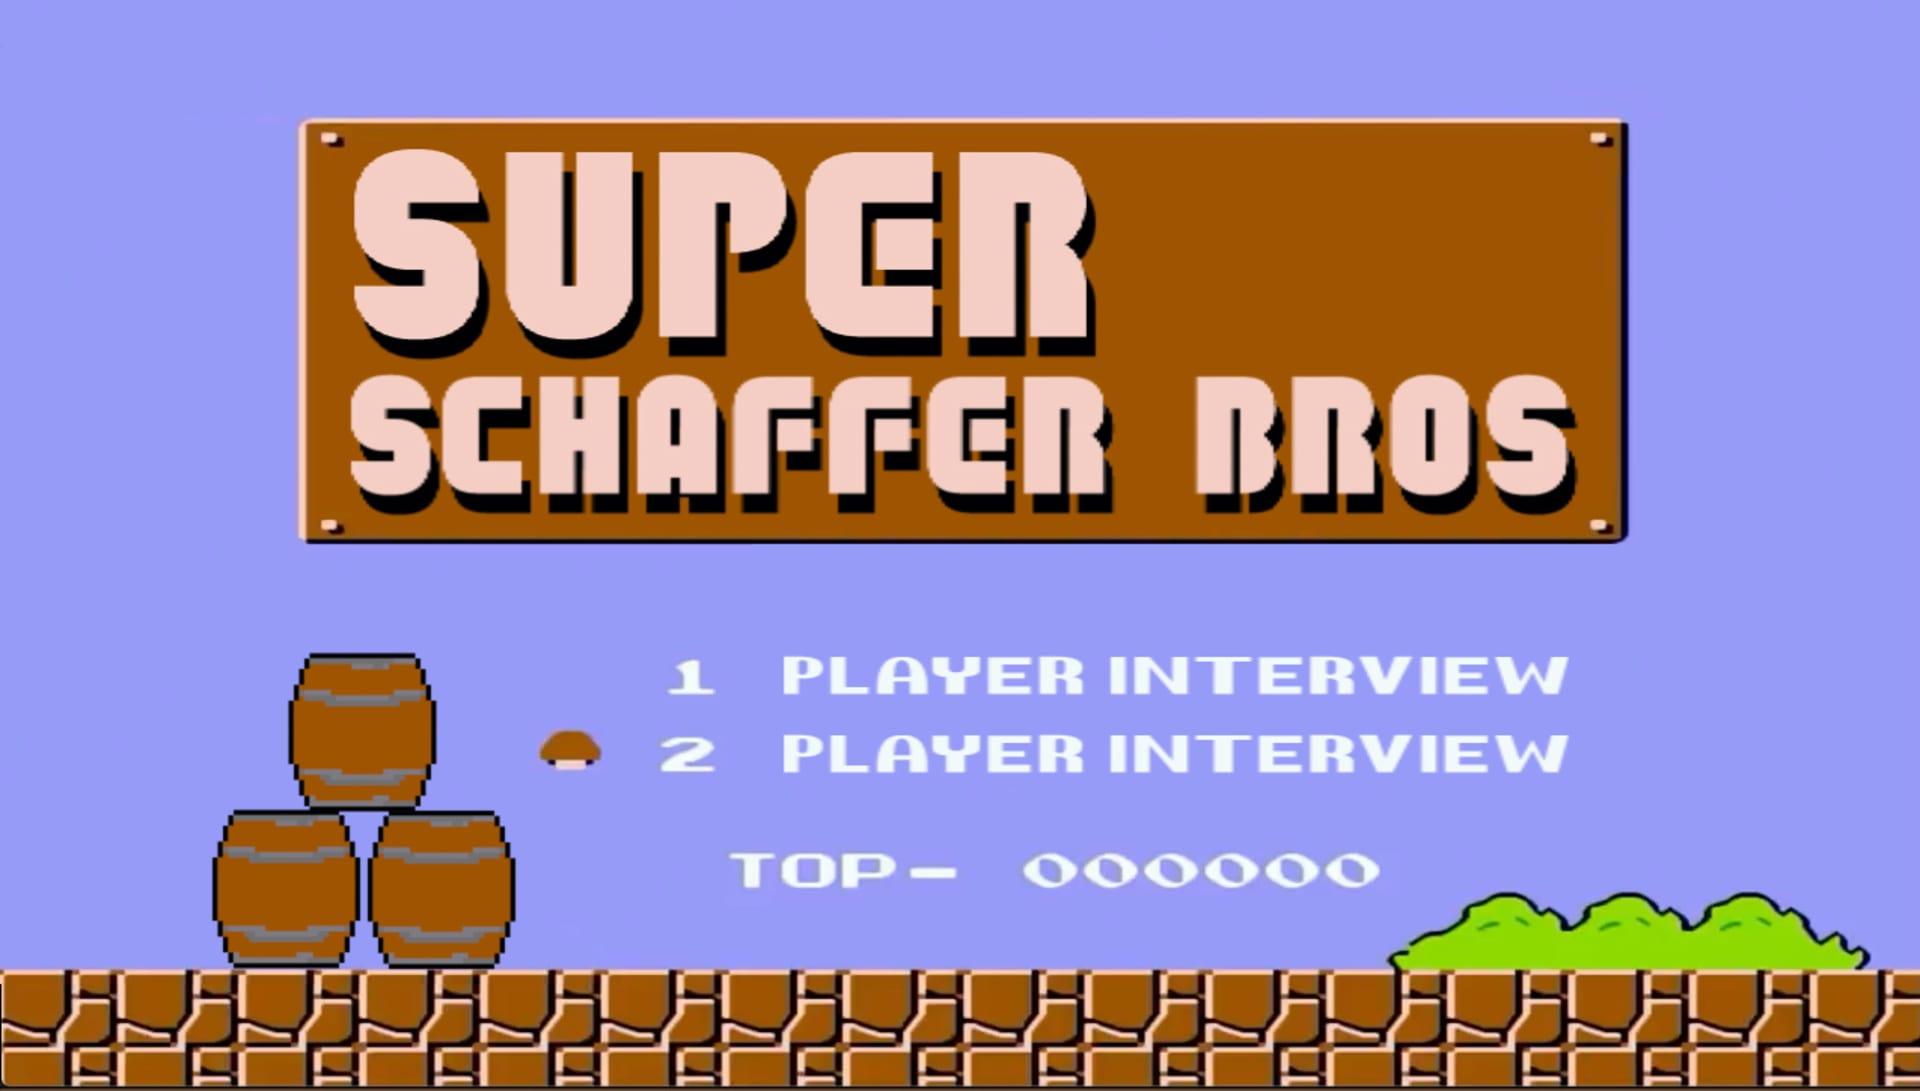 Super Schaffer Bros